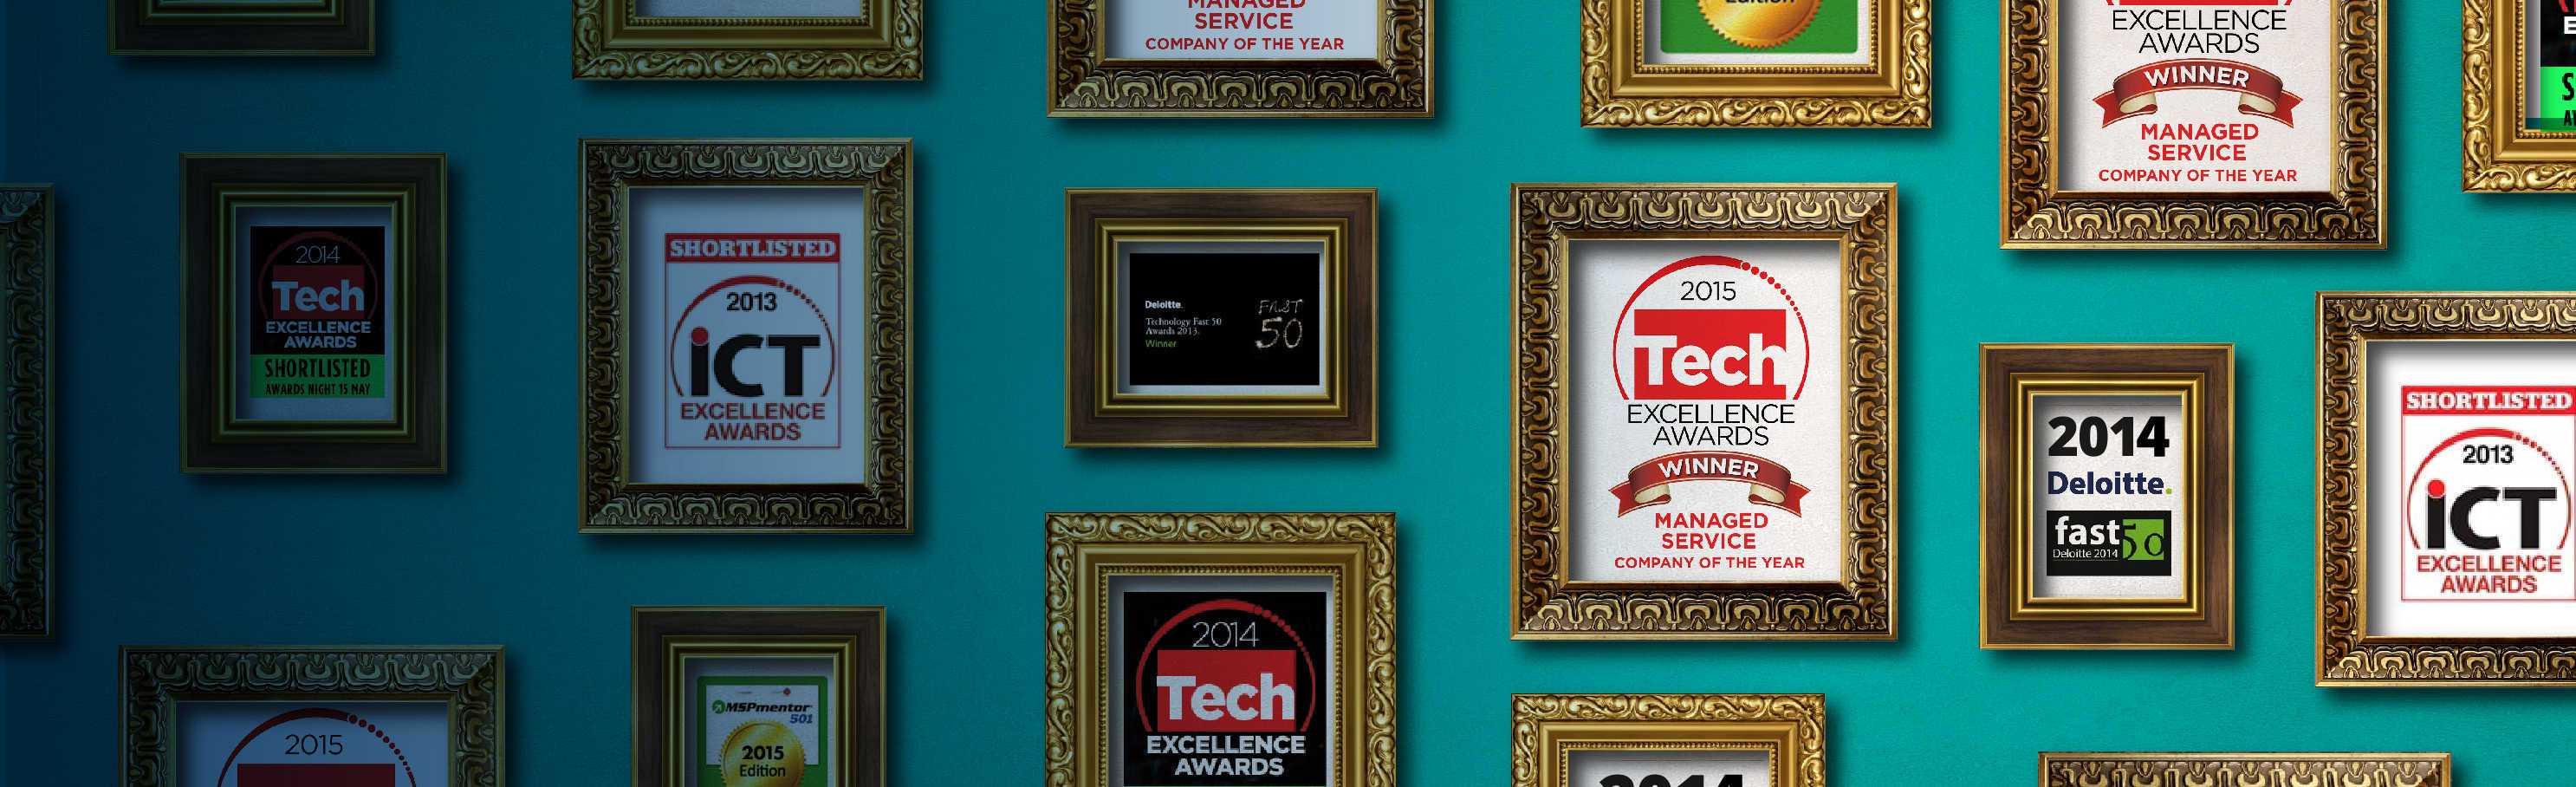 xxxx-15-TRI-ICT-Award-Web-Banner-v2-01